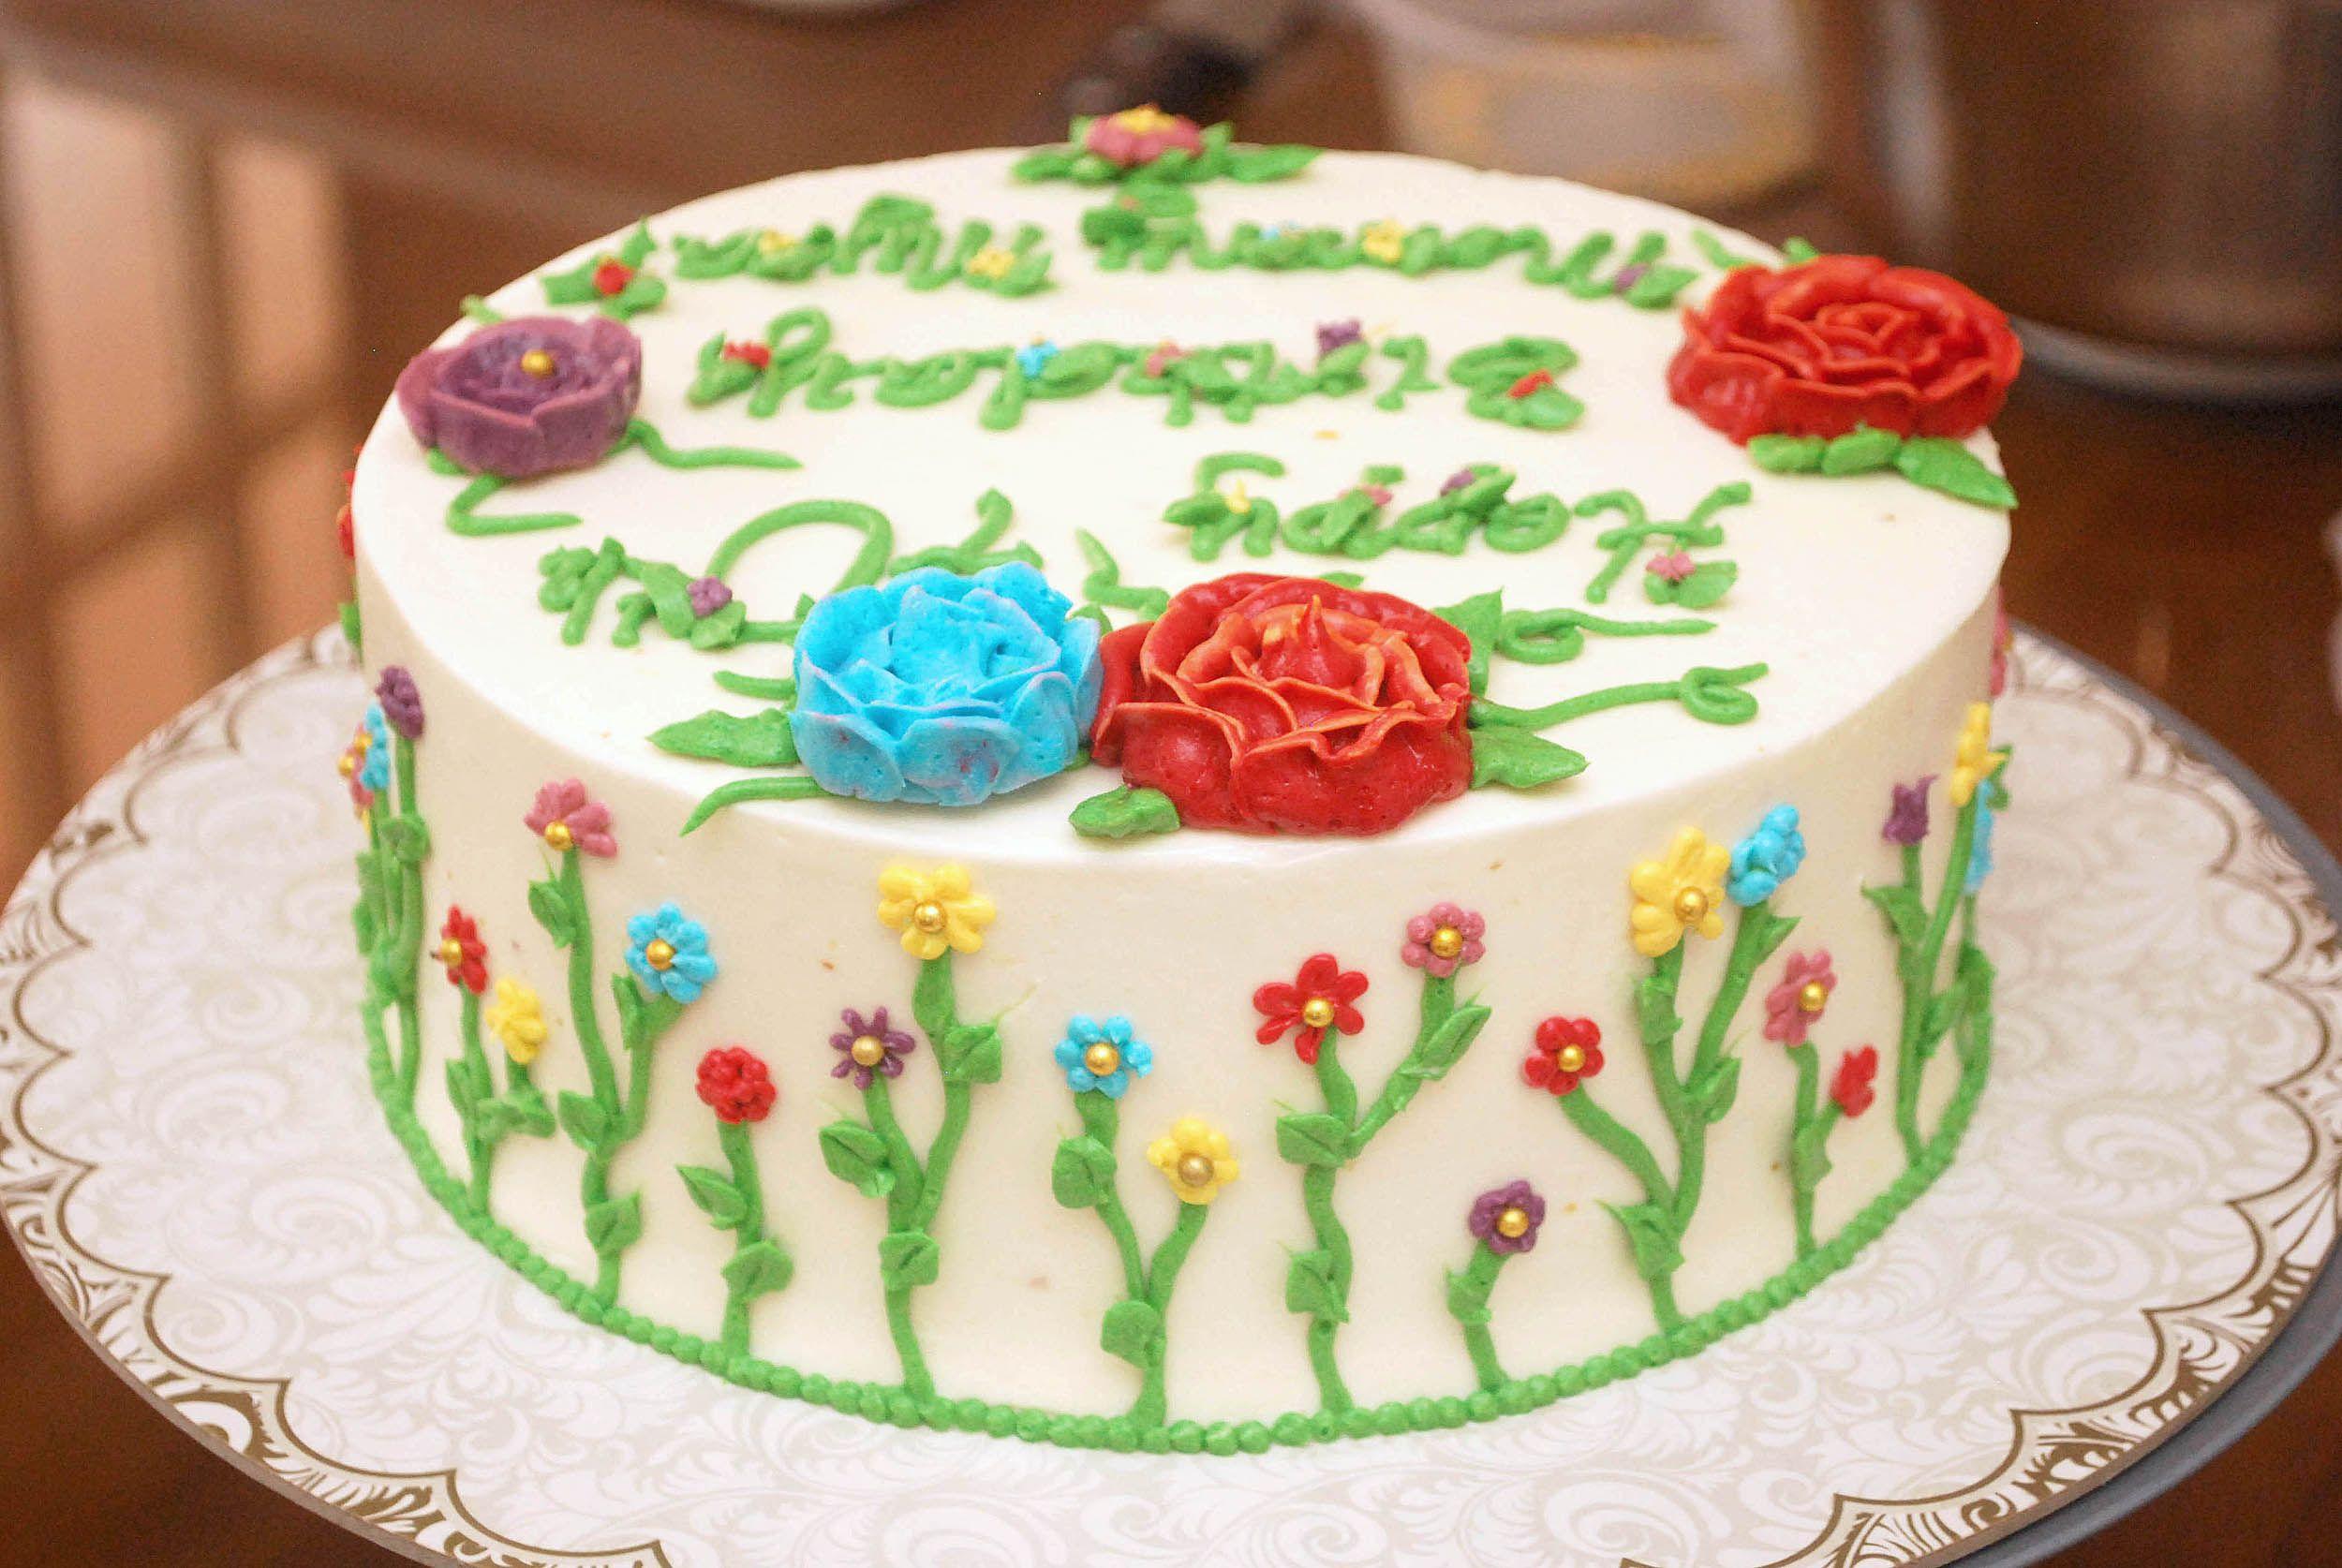 Decorate Birthday Cakes Birthday Cakes Decorating And Cake Designs